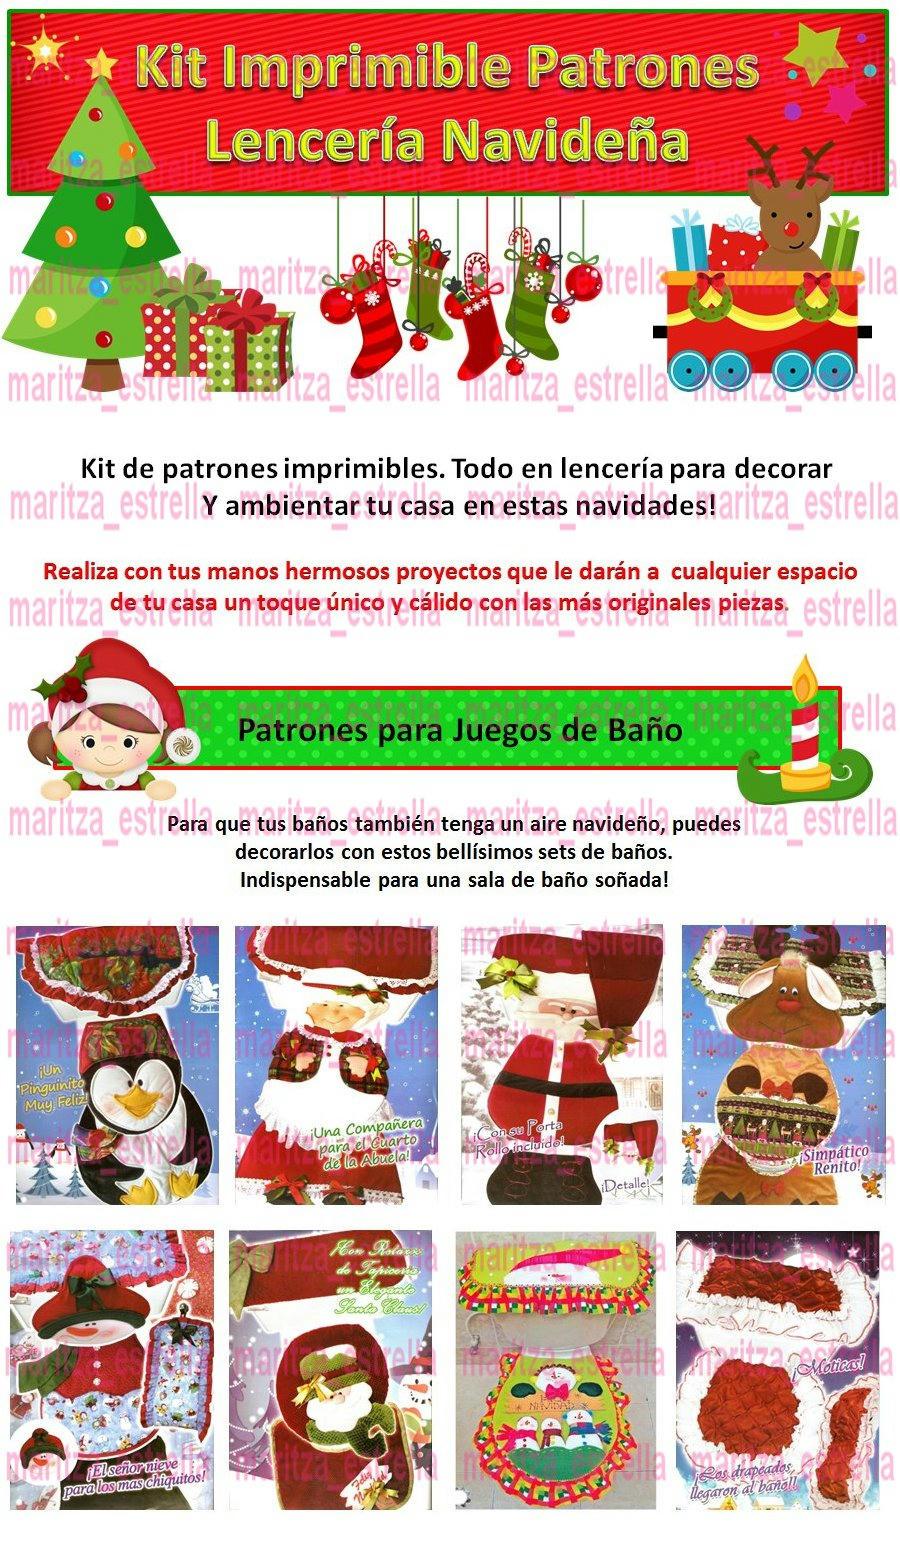 Imagenes De Lenceria De Baño De Navidad:Kit Patrones Lenceria Navidad Juegos De Baños Muñecos Arbol BsF980